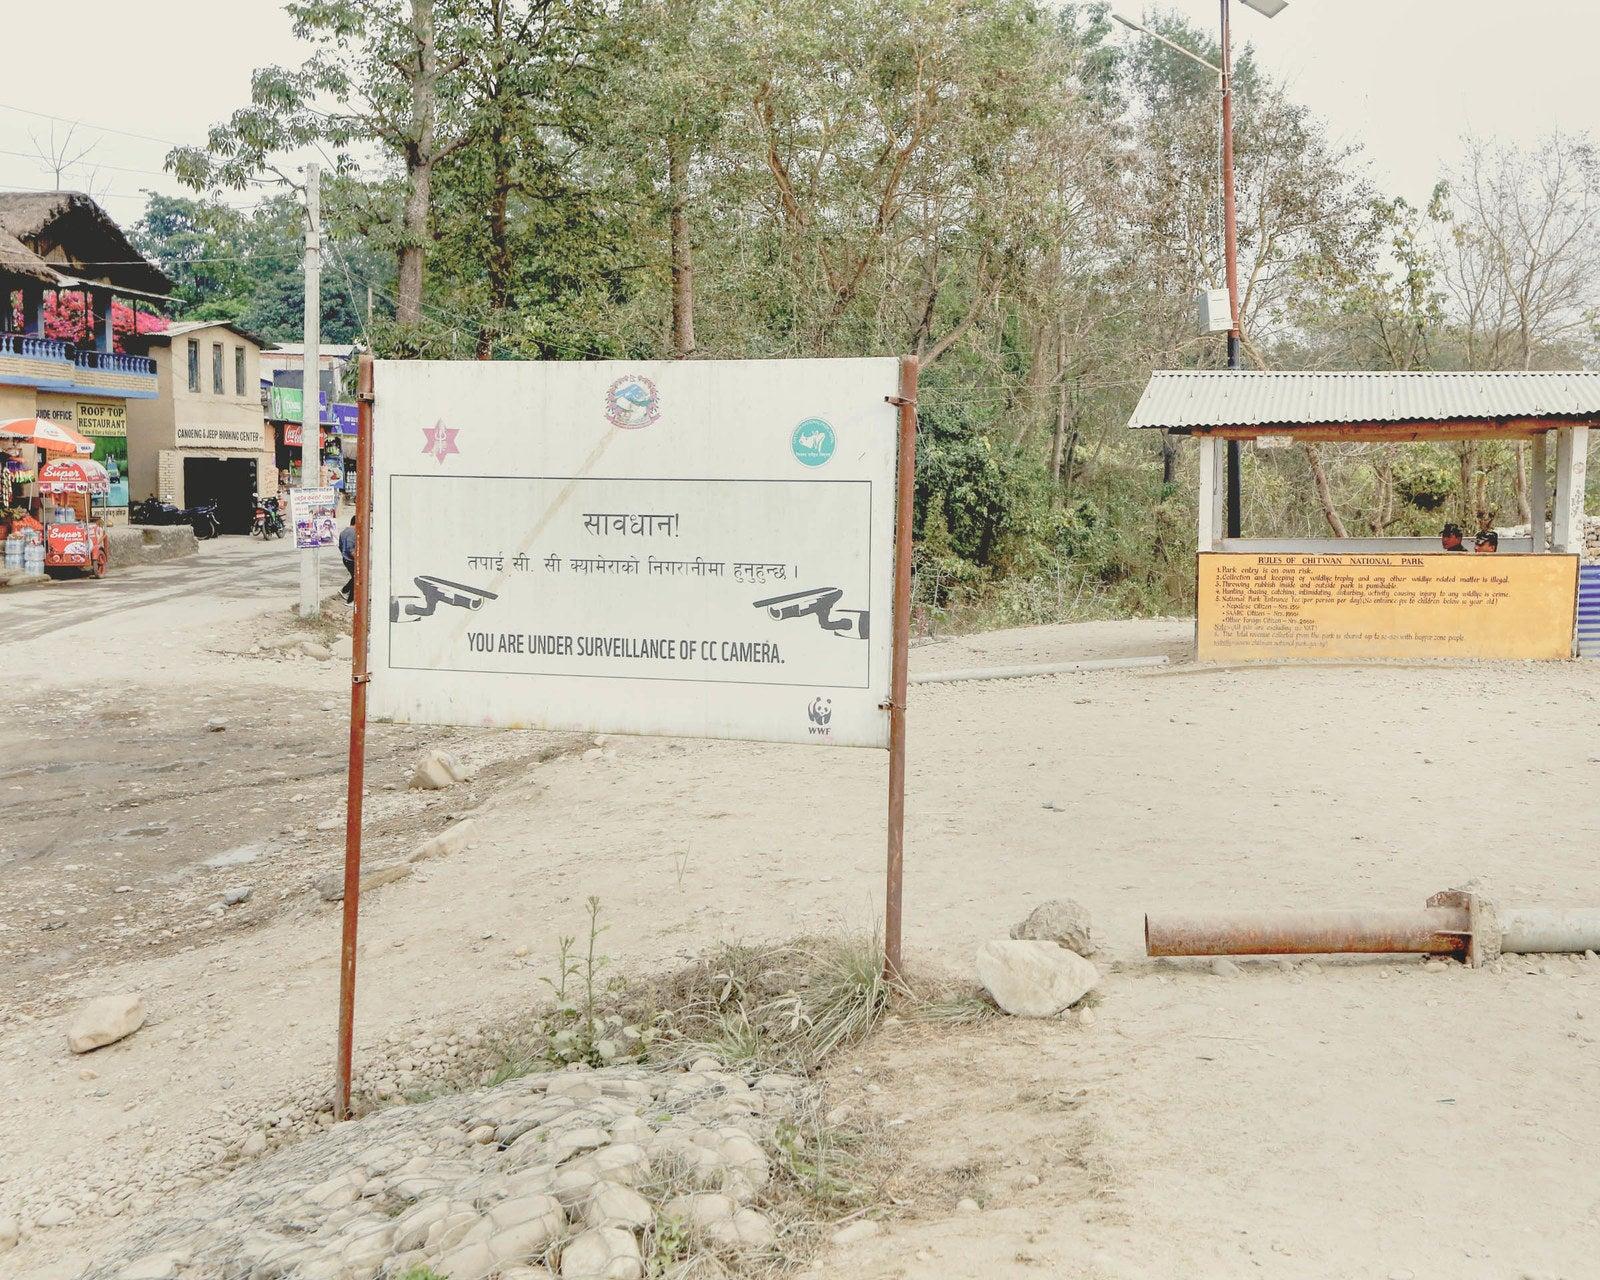 A sign near an entrance to Chitwan.